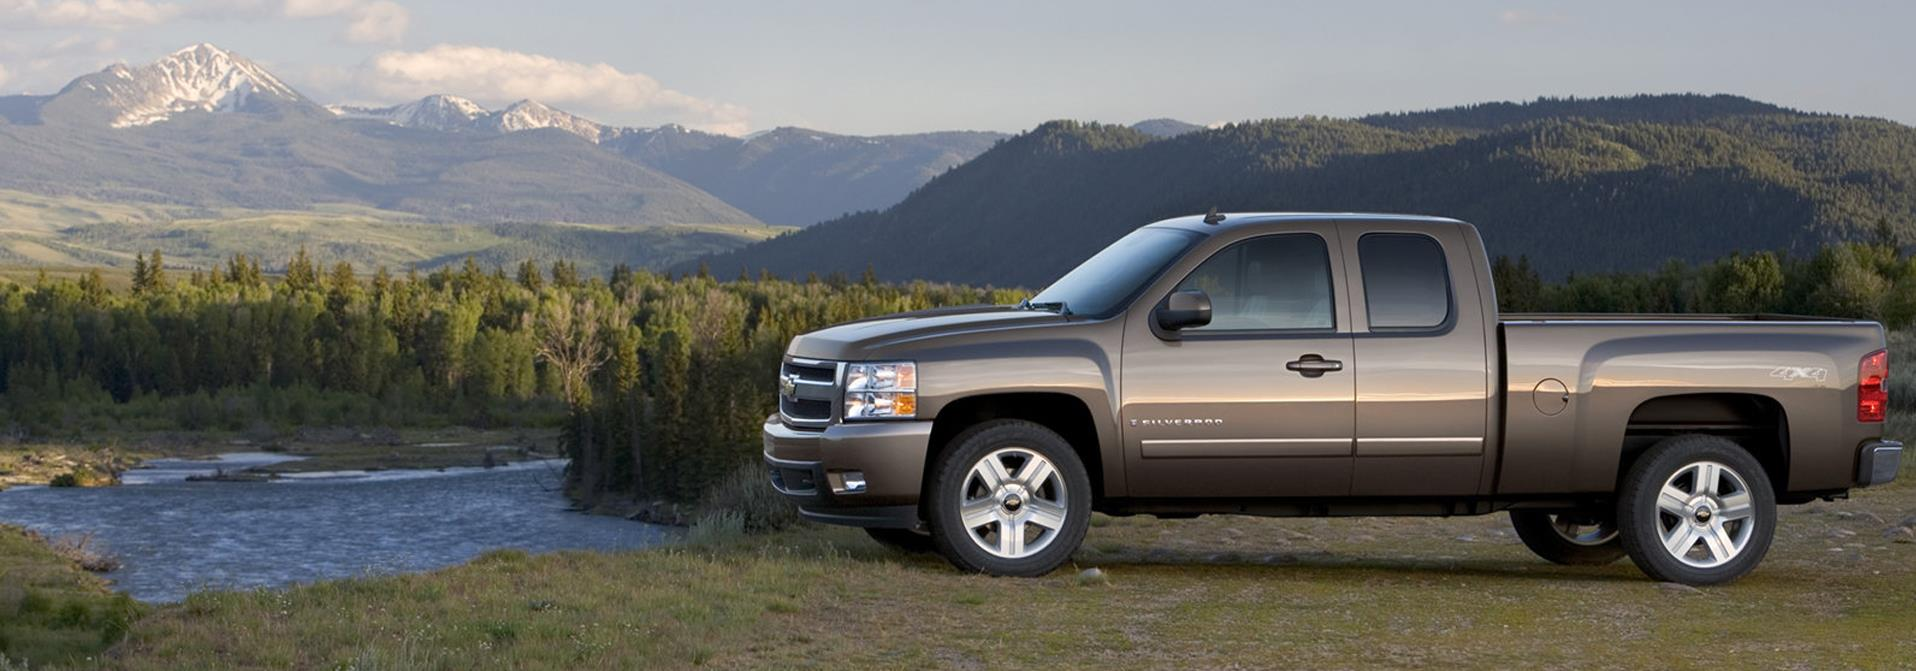 New & Used Cars Trucks Sales